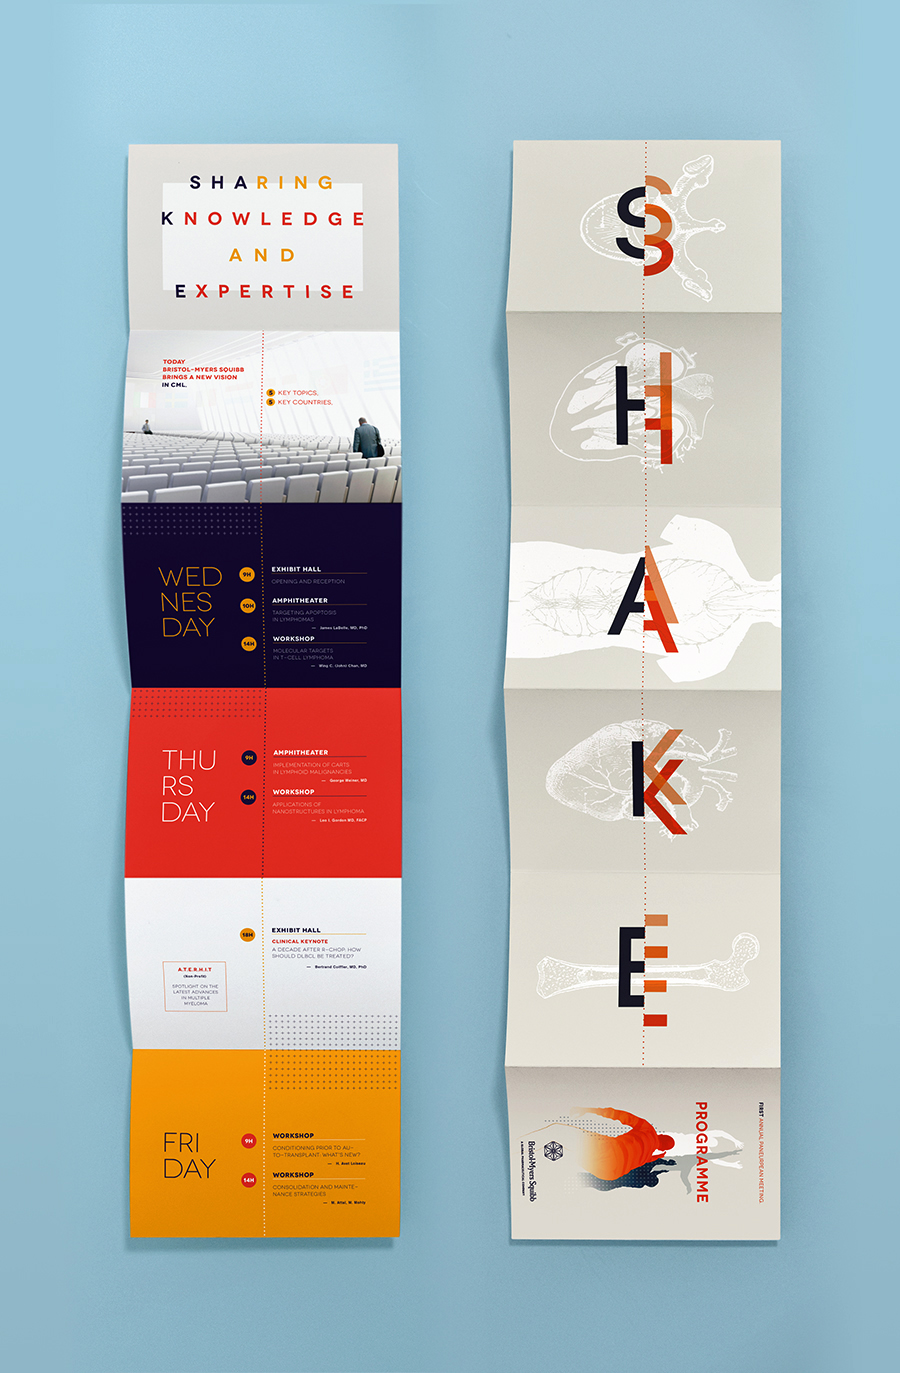 Brisol Myers Squibb Event Branding Materials On Behance Pamphlet Design Corporate Brochure Design Booklet Design